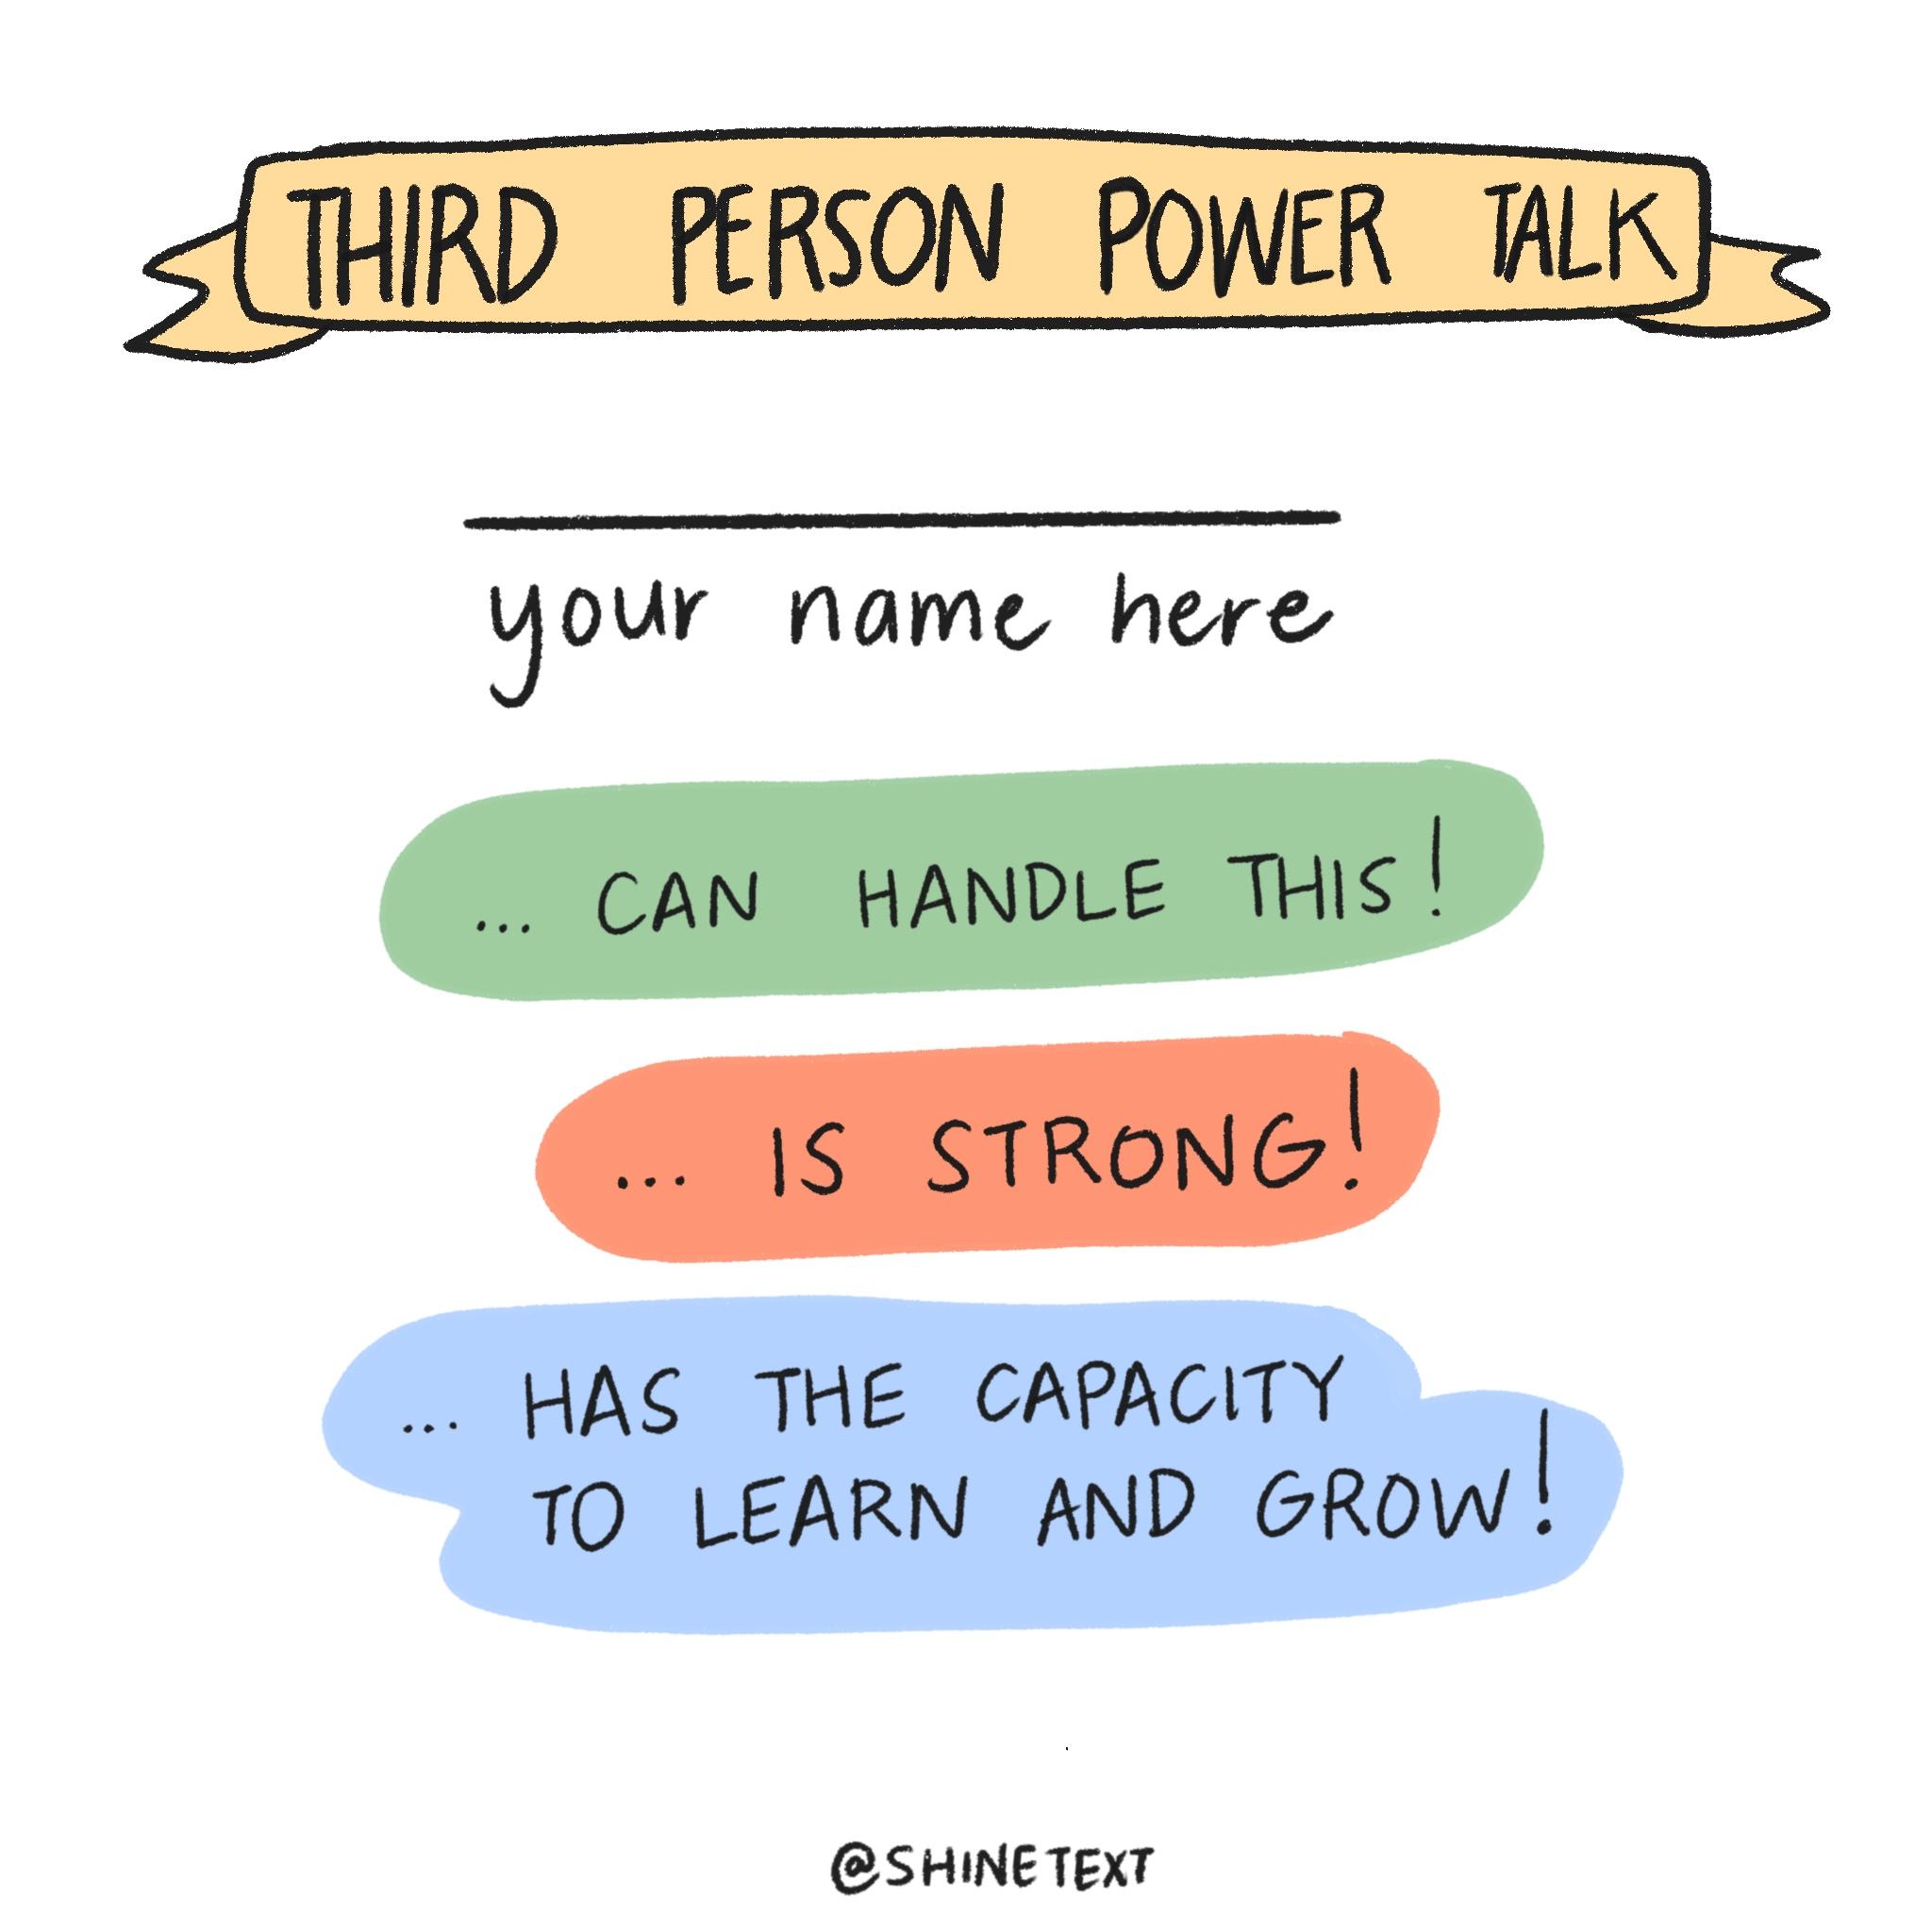 Third Person Power Talk